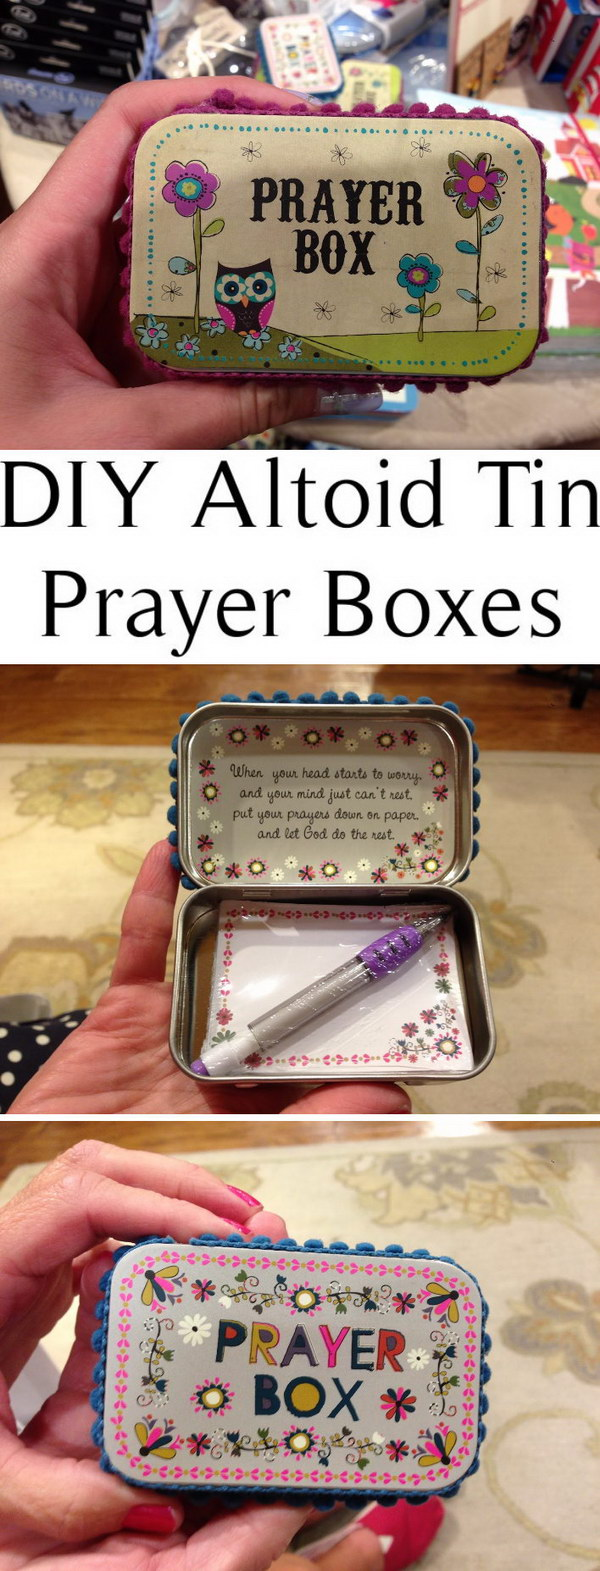 DIY Altoid Tin Prayer Boxes.